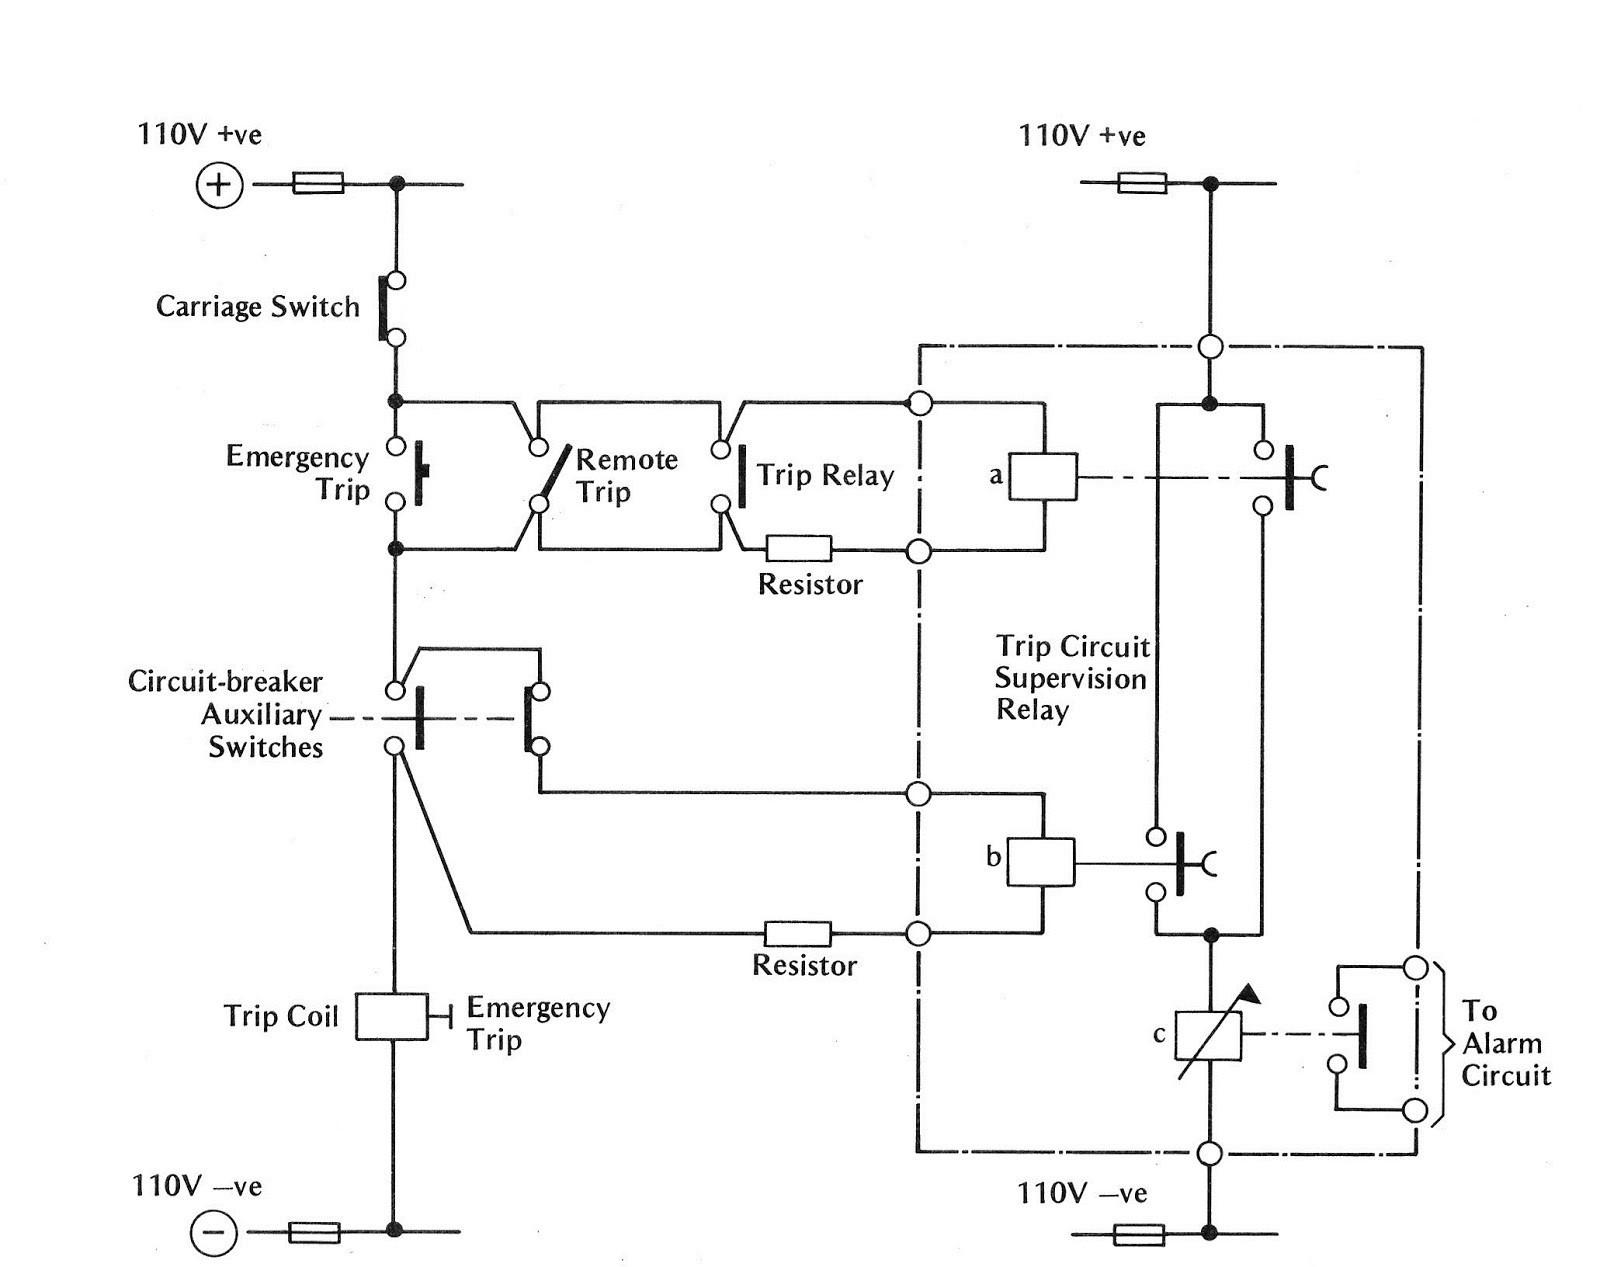 Shunt Trip Breaker Wiring Diagram - Motherwill - Shunt Trip Breaker Wiring Diagram